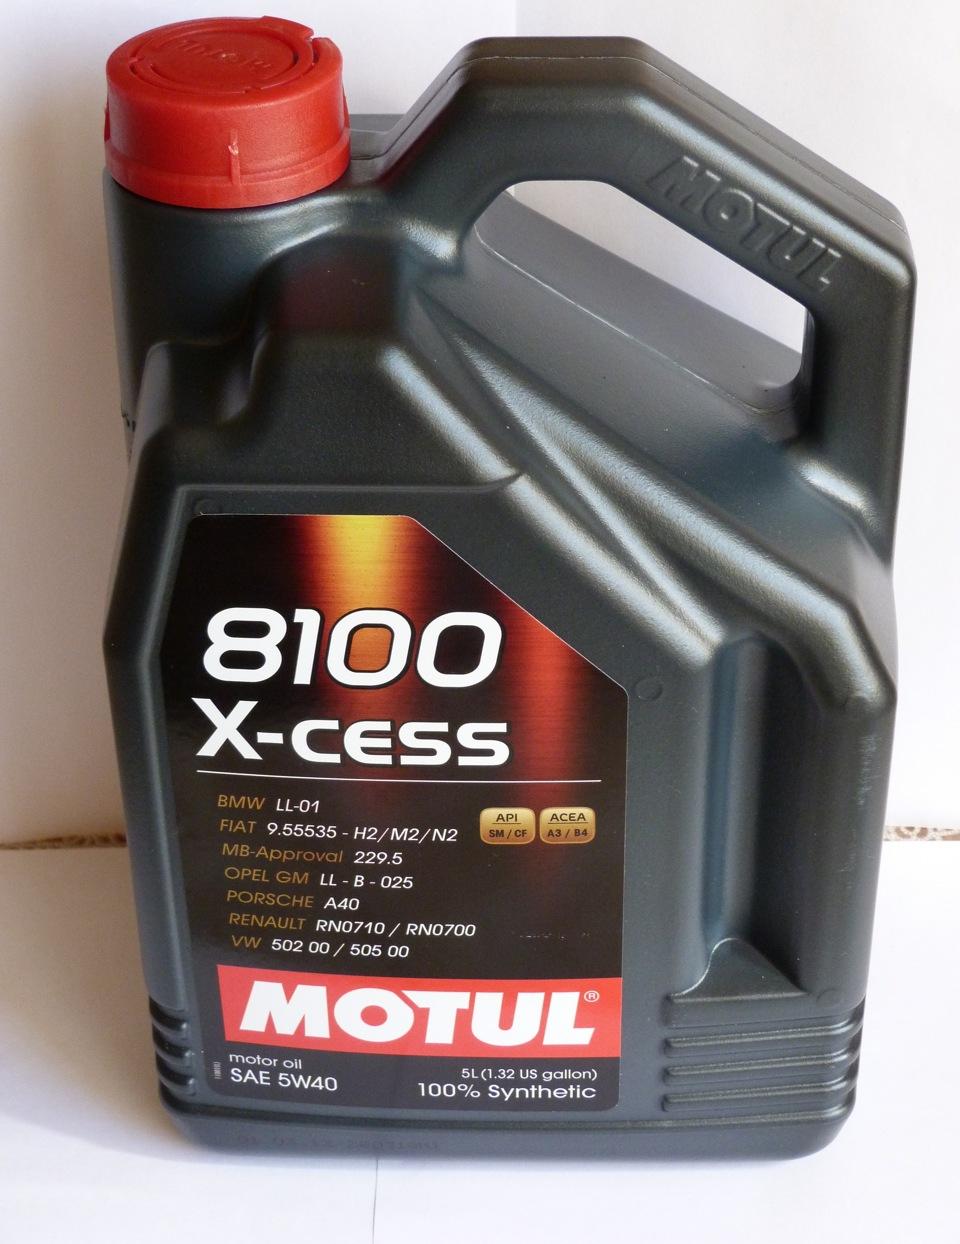 Моторное масло mobil » Суперактиватор